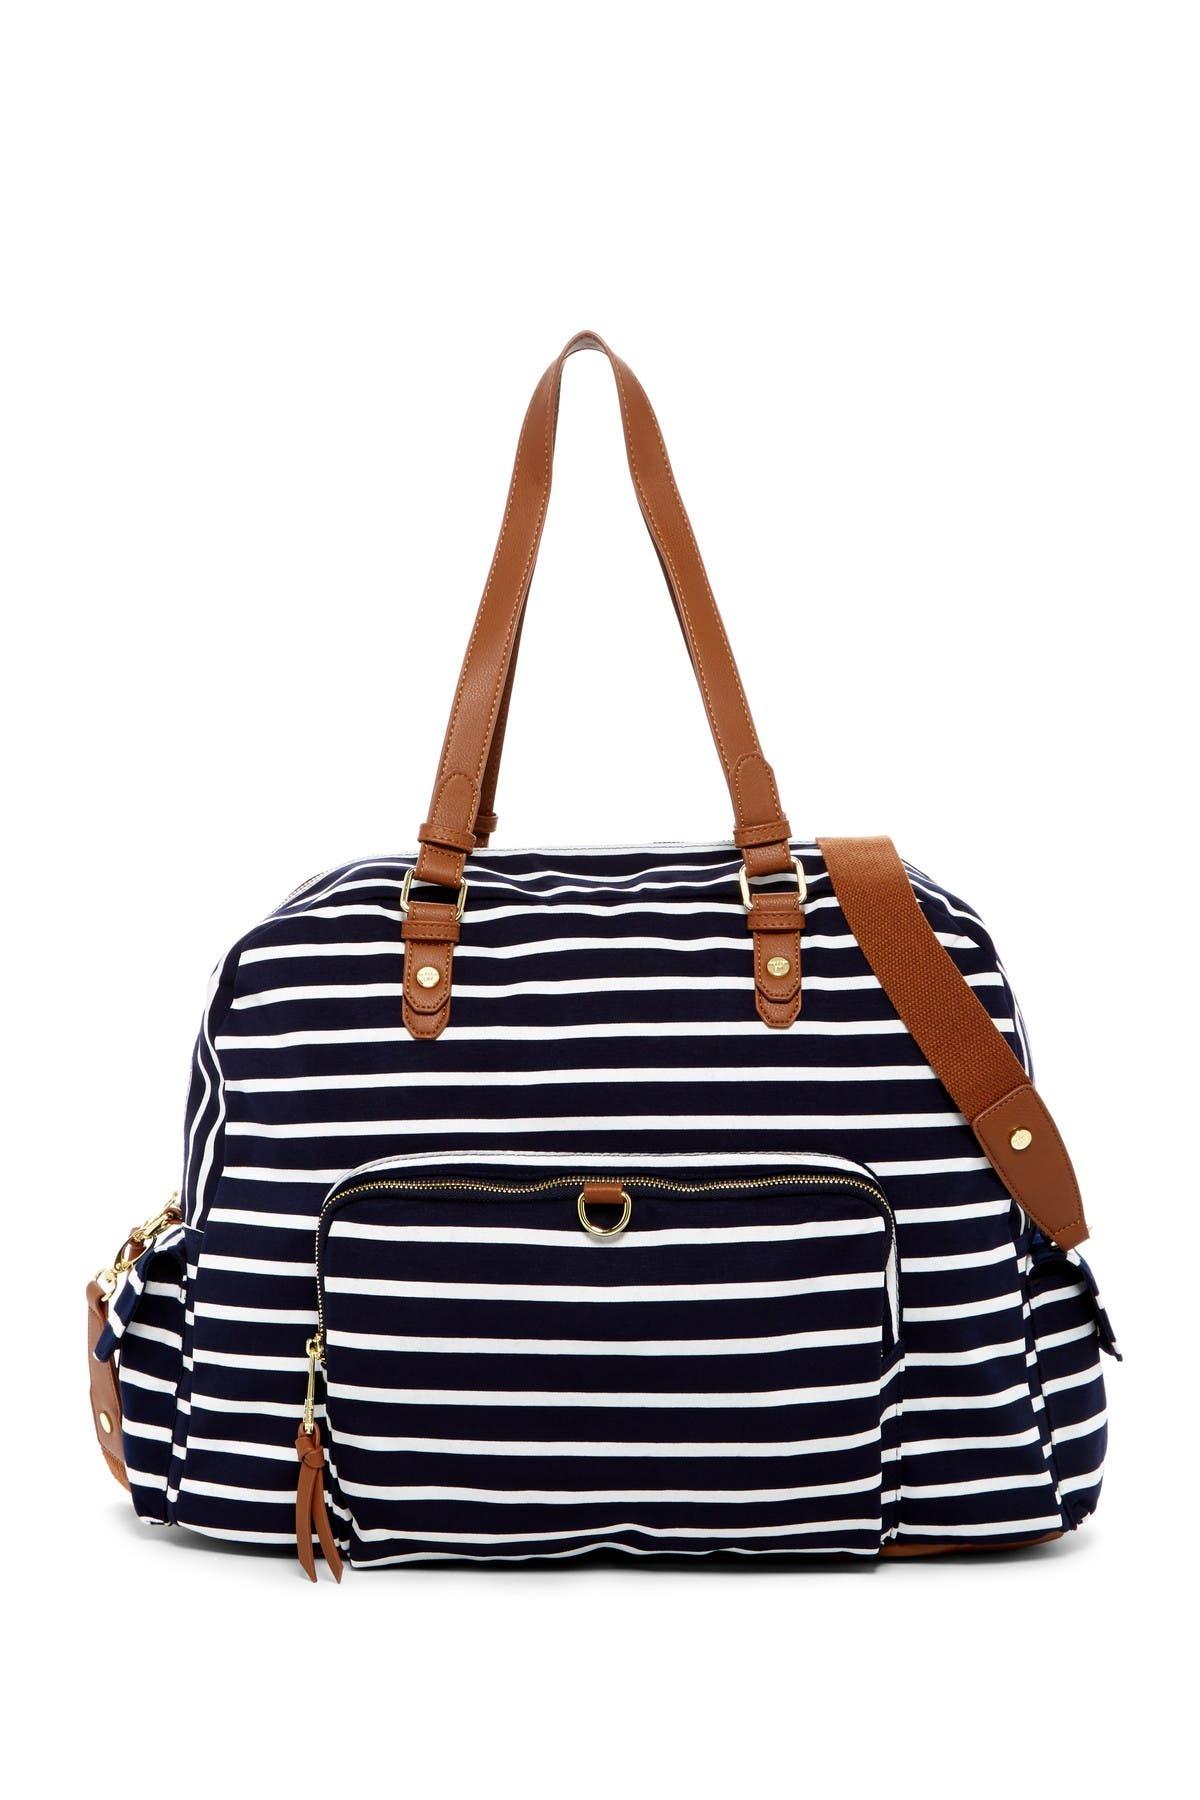 Image of Madden Girl Glory Stripe Large Jersey Weekend Bag